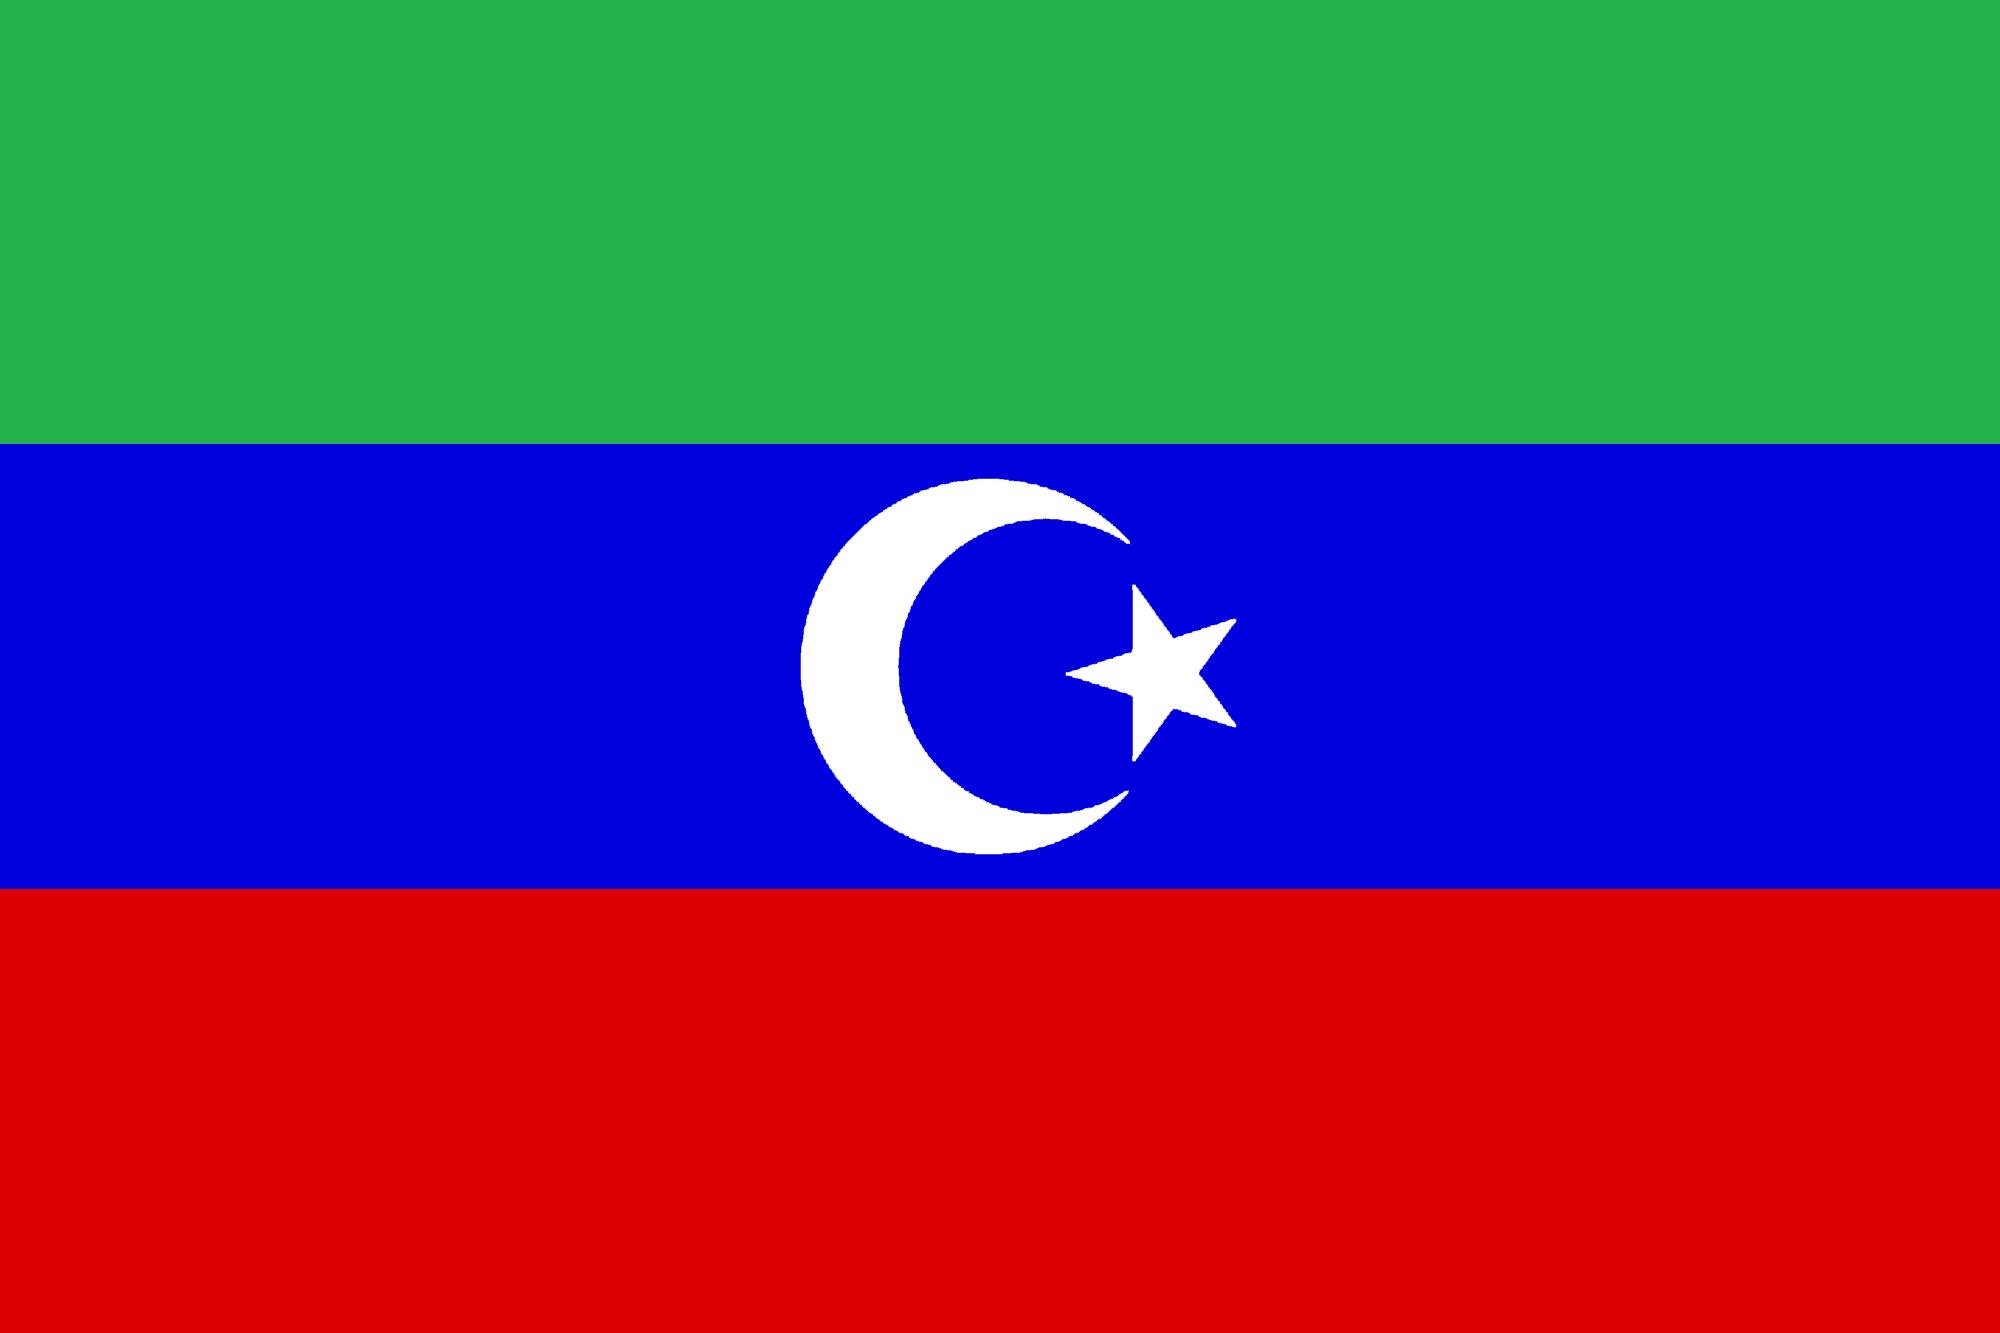 Bandera-Turkmenistán-GIA.png